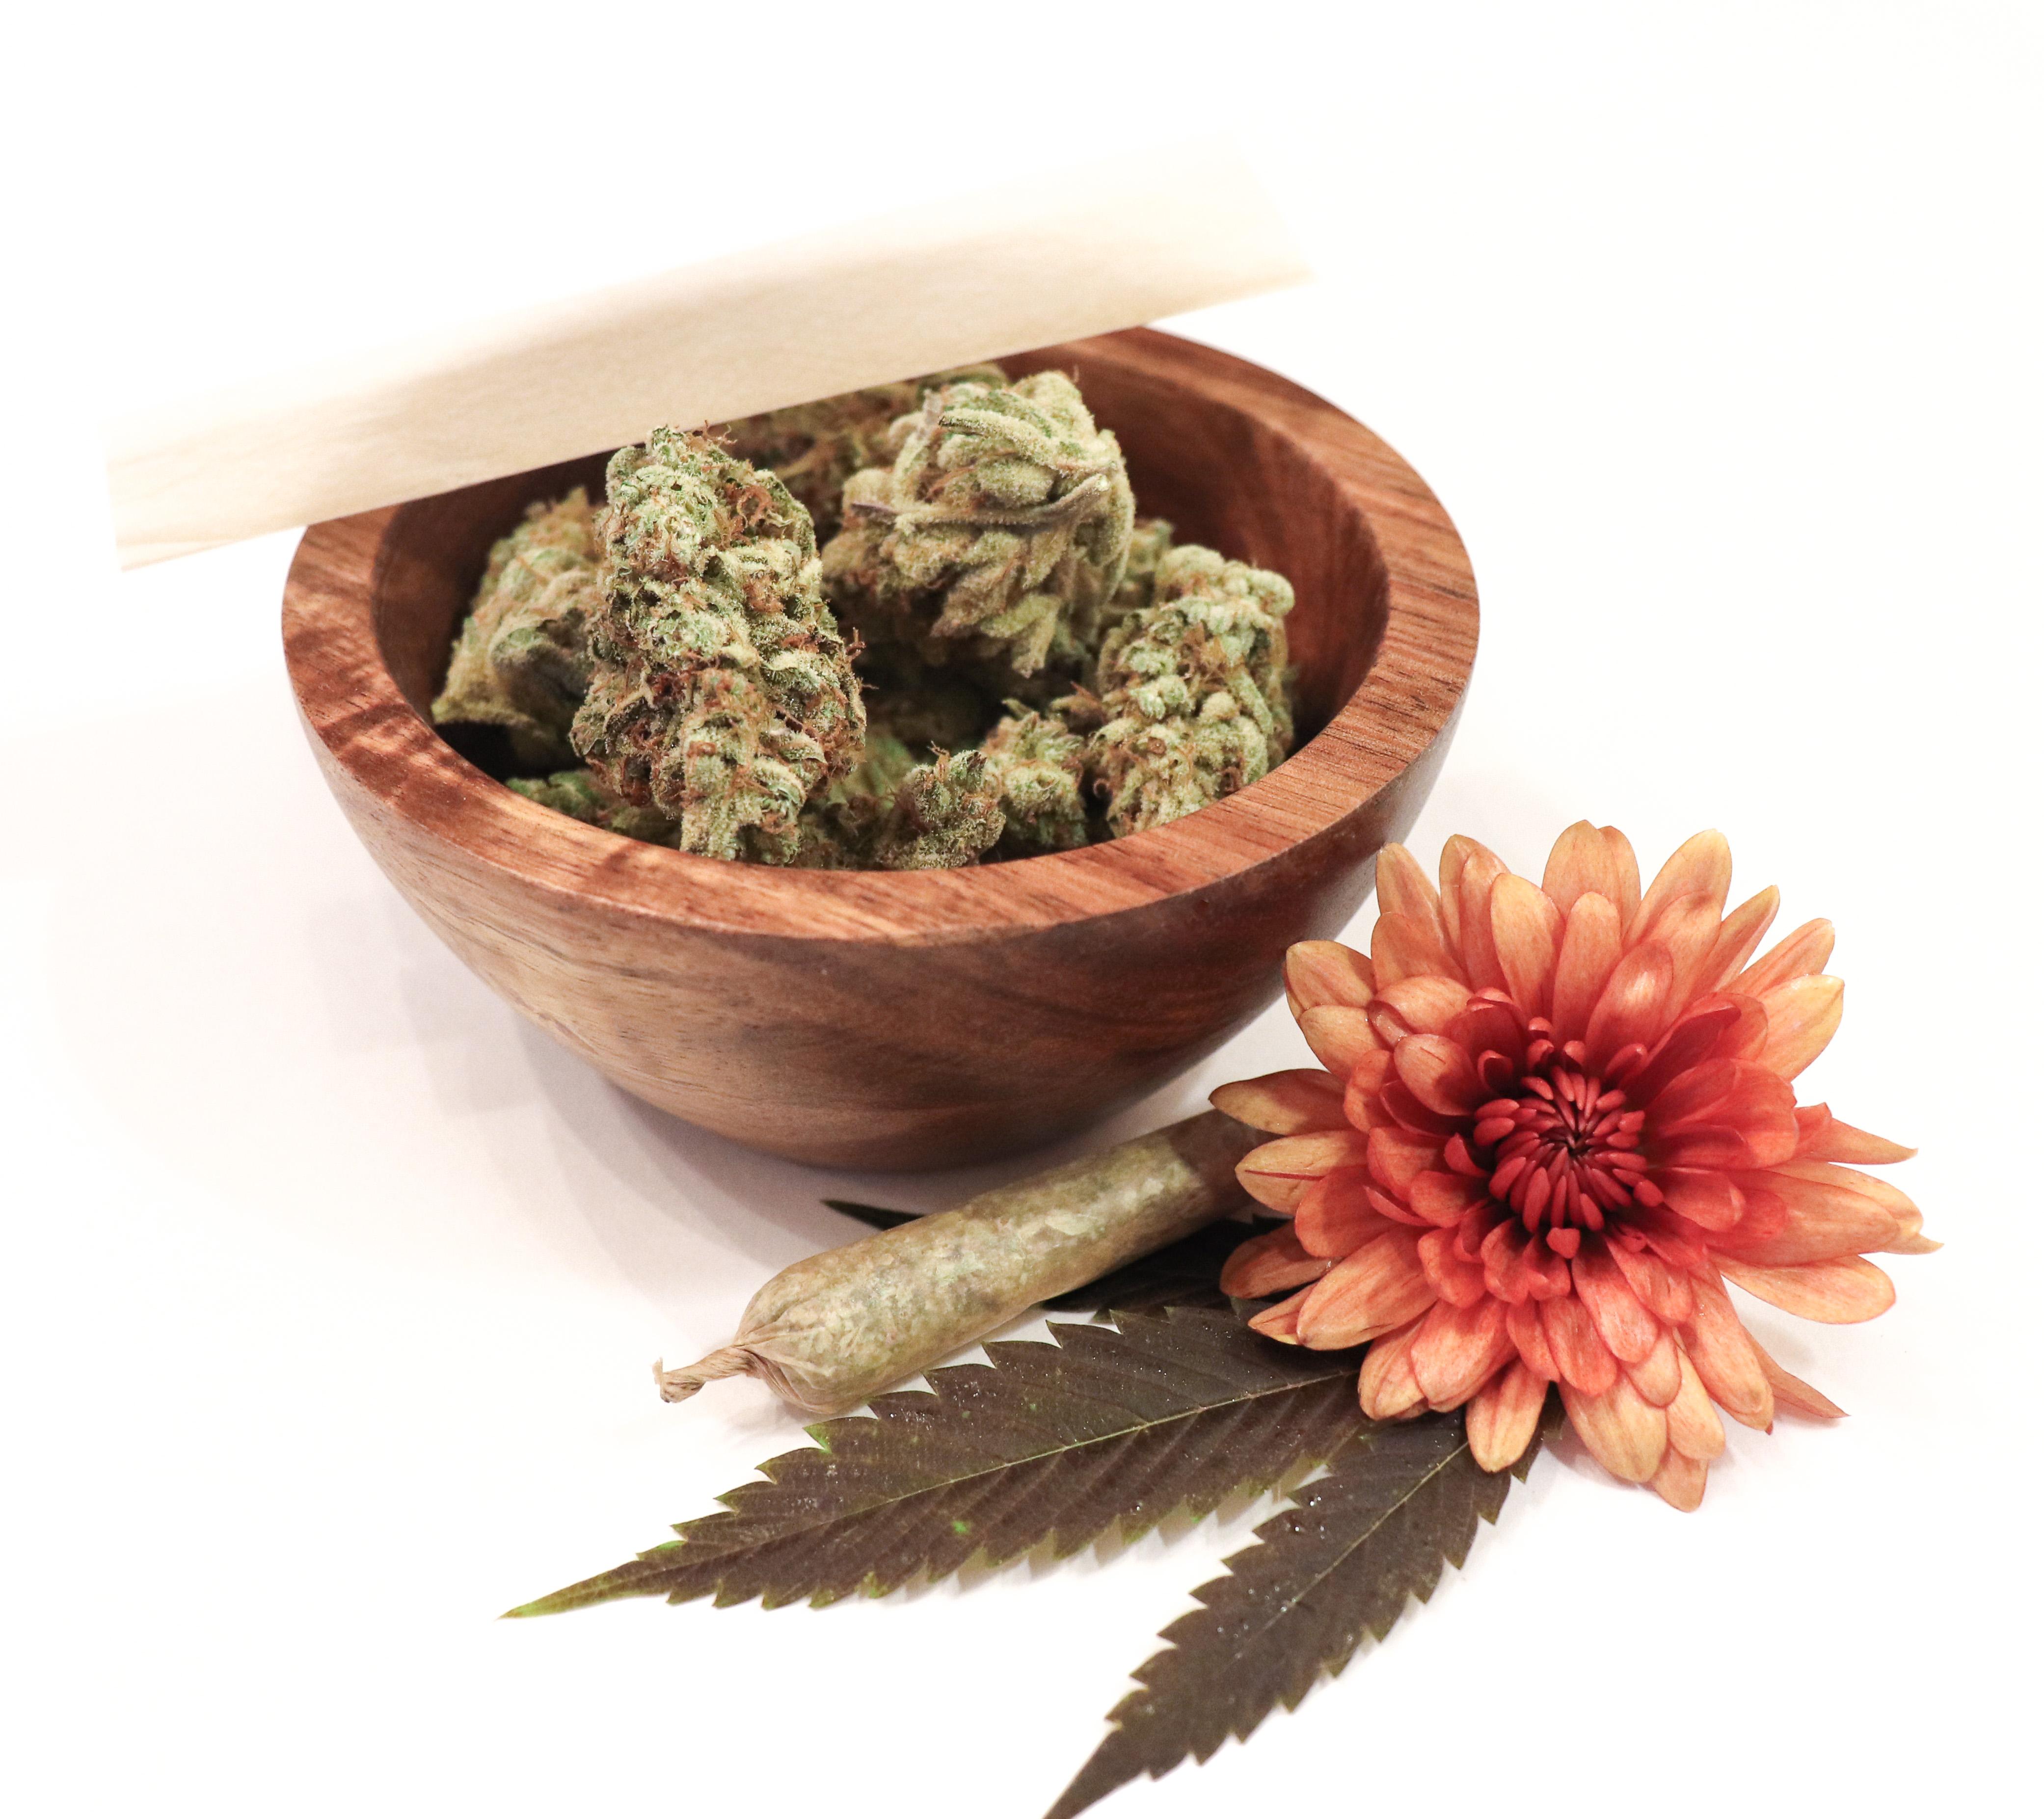 Marijuana flower buds in a bowl.